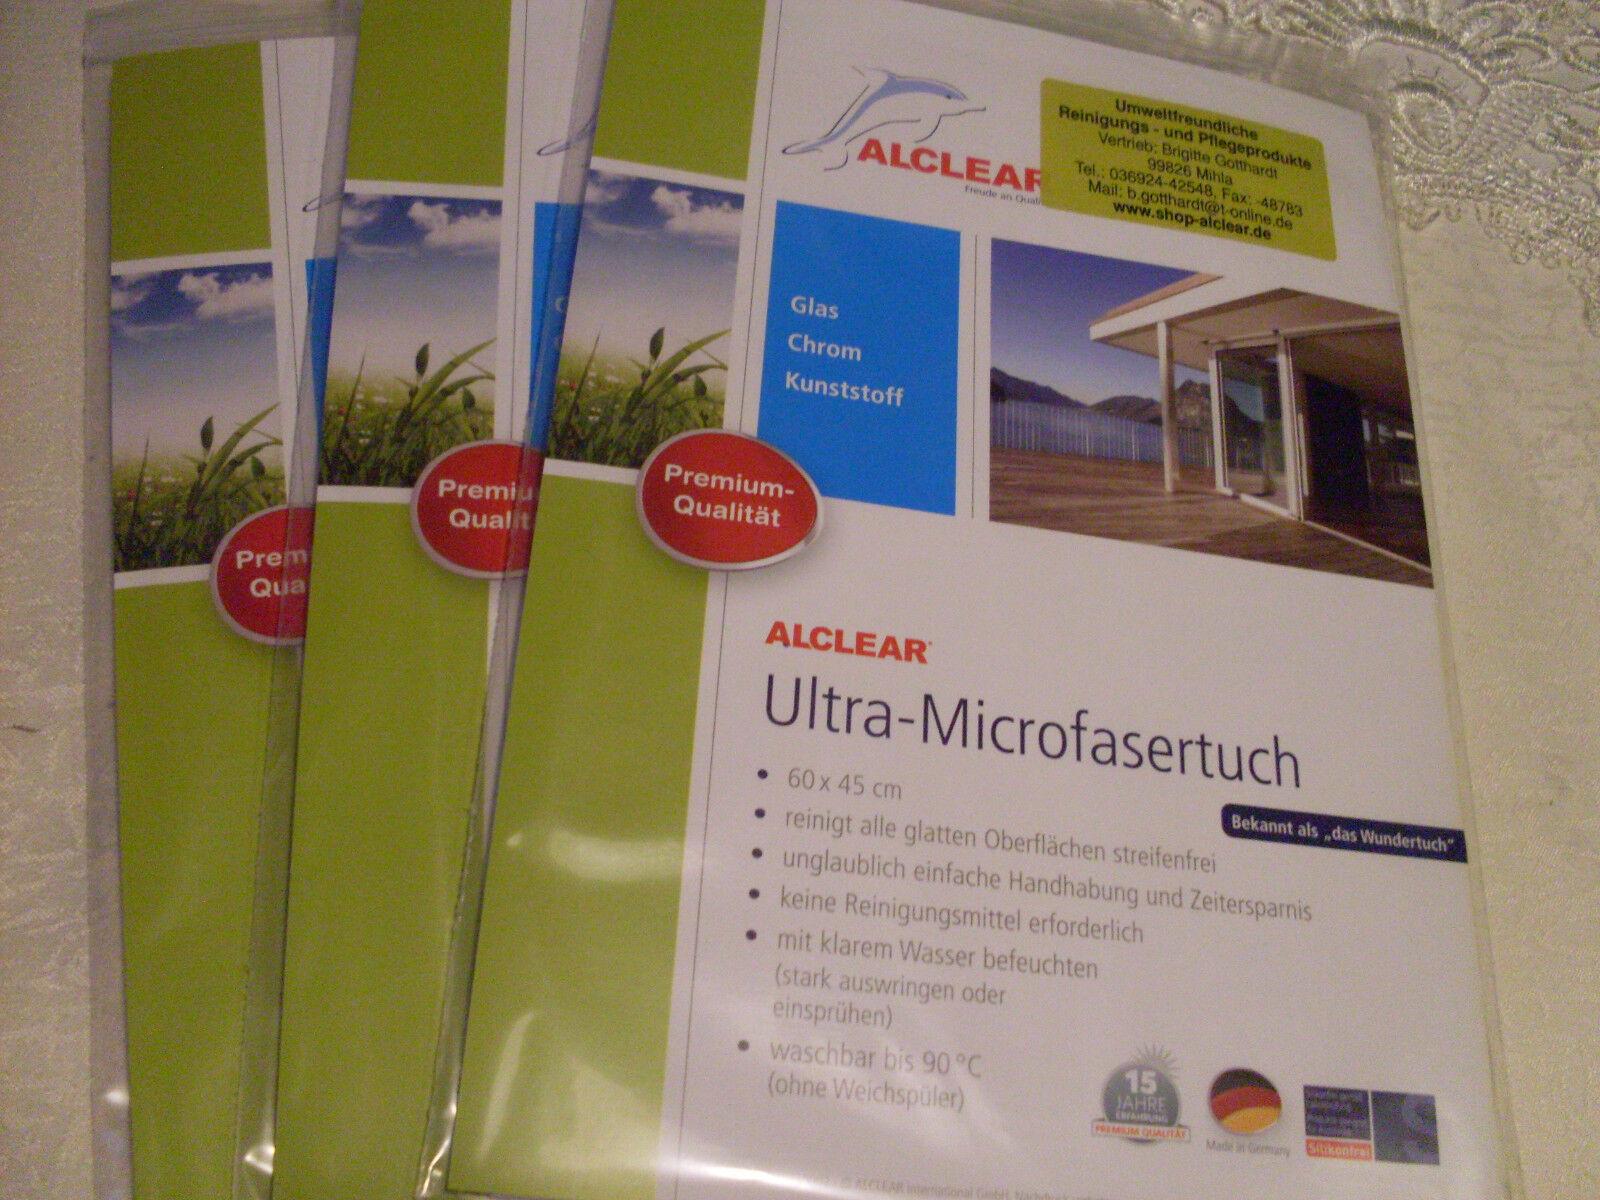 Alclear - Ultra - Microfaser Fenstertuch  60x45cm  3erSet   Verrückter Preis, Birmingham    Stilvoll und lustig